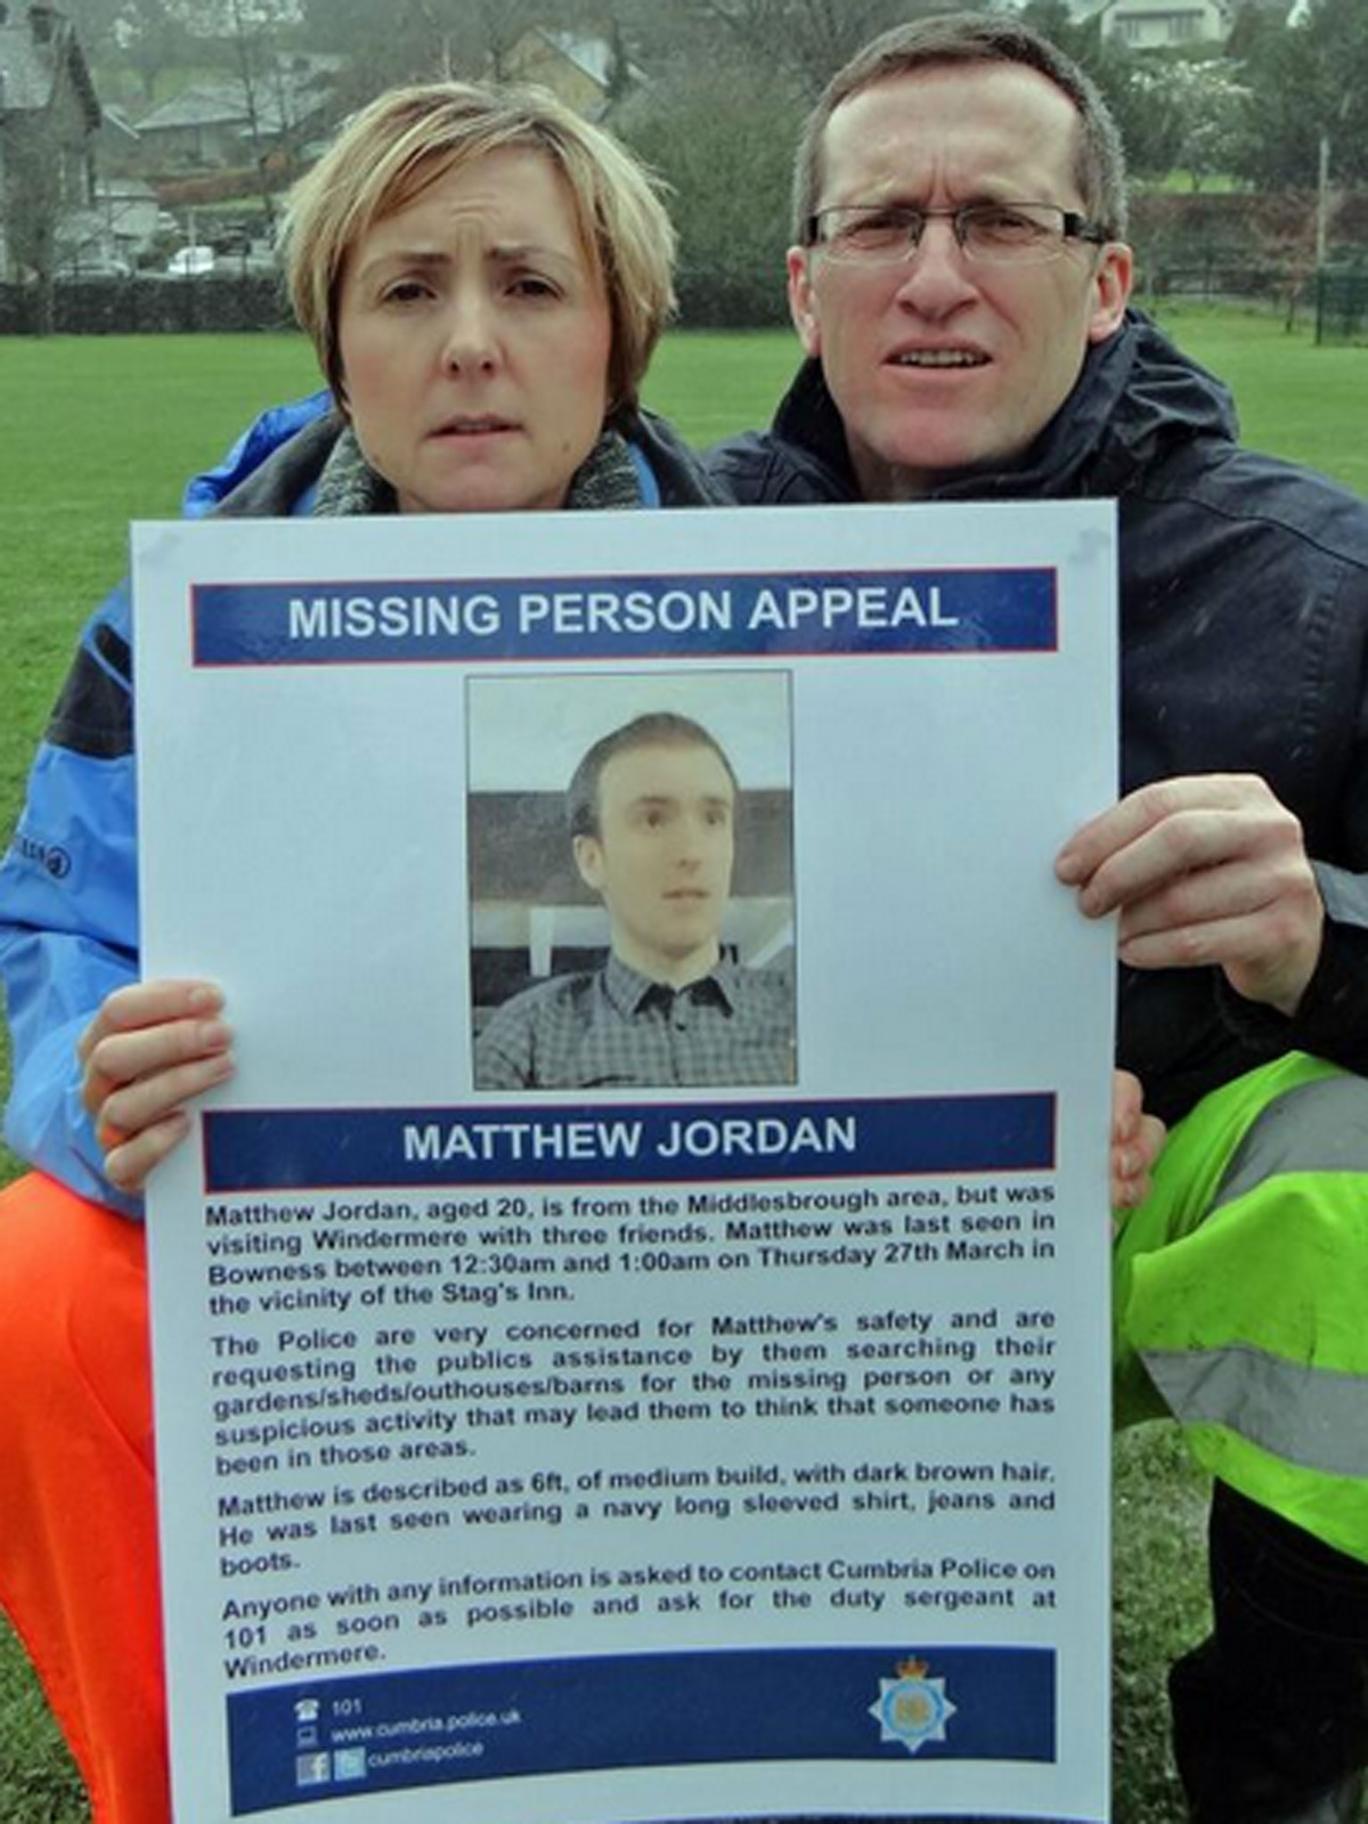 Matthew Jordan has been missing for over a week